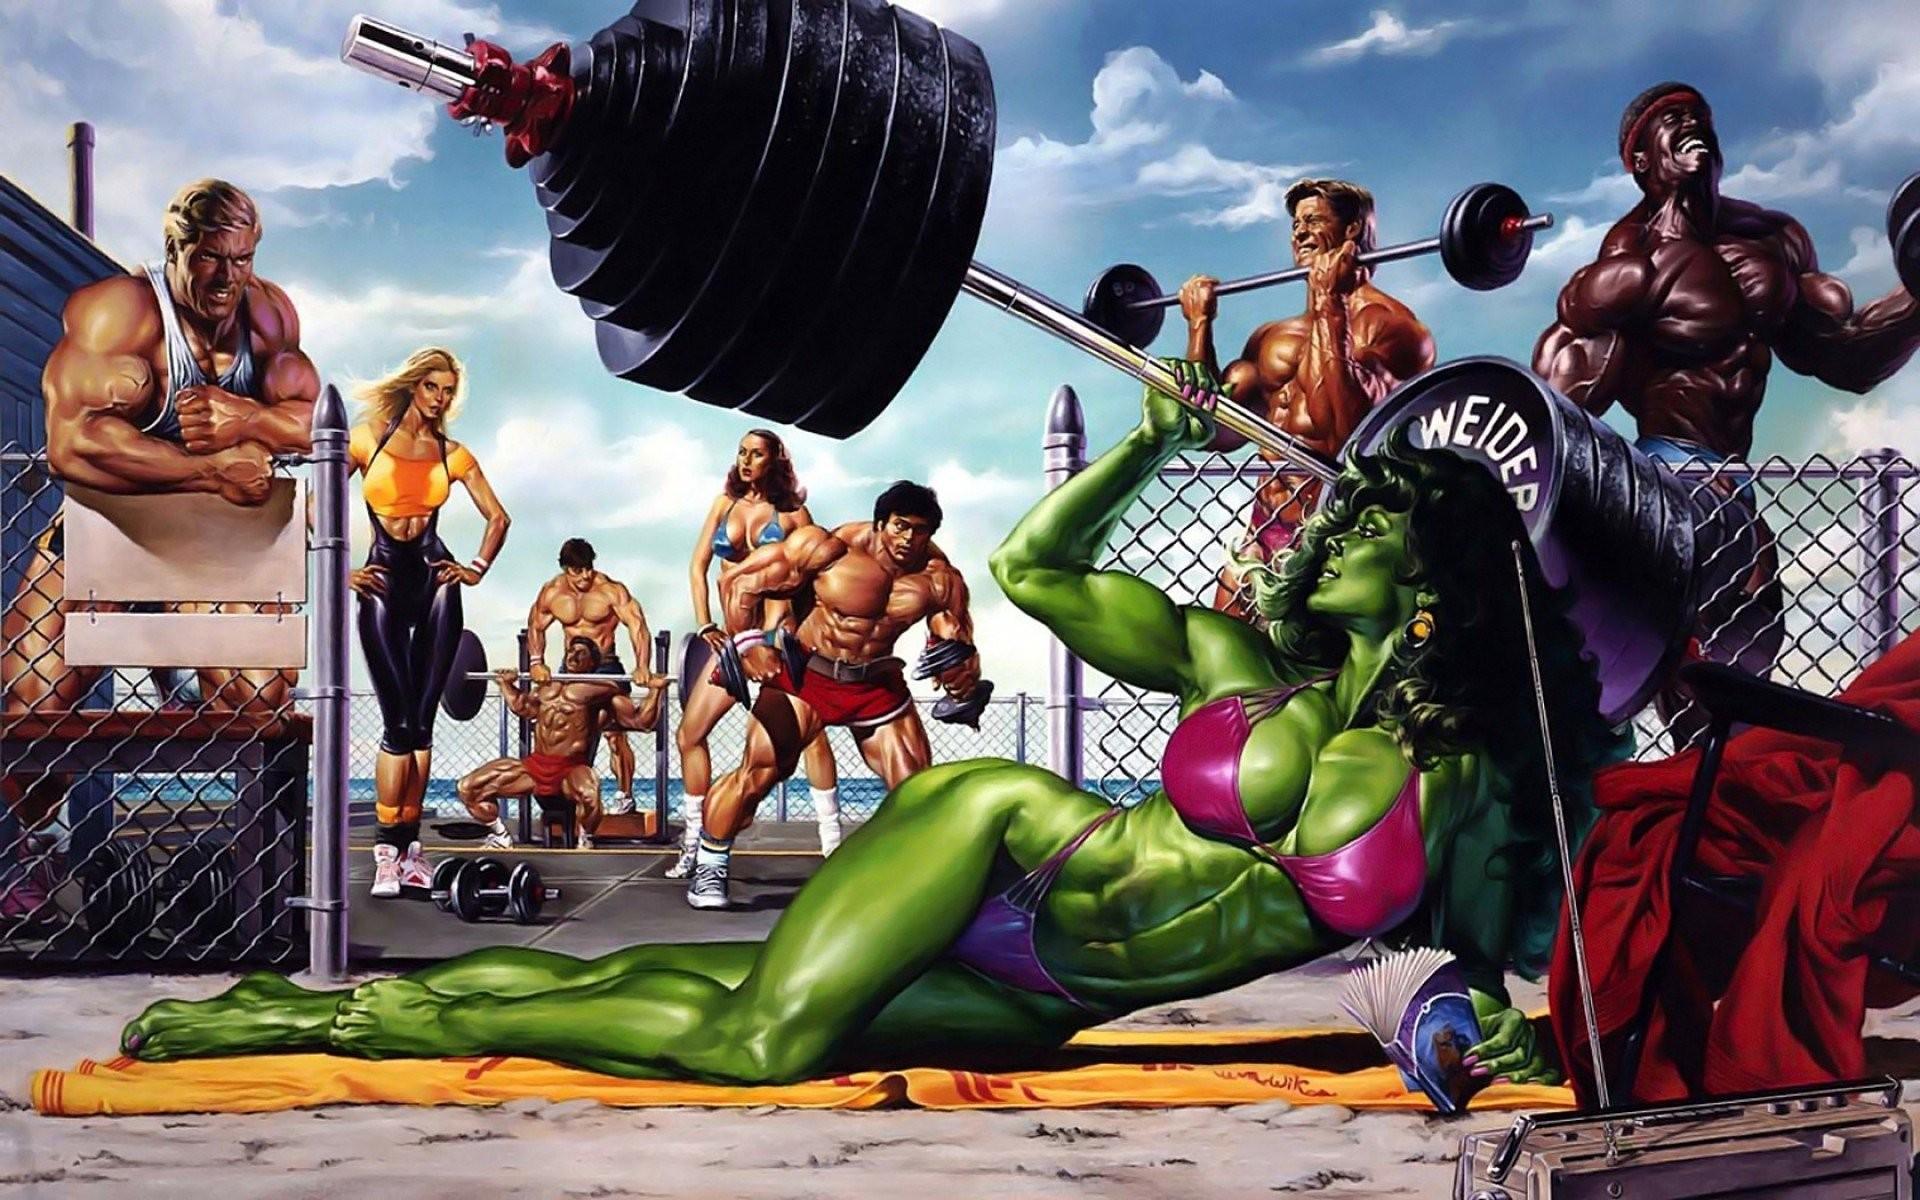 She-Hulk images She-Hulk – Bikini Weight Lifting HD wallpaper and  background photos